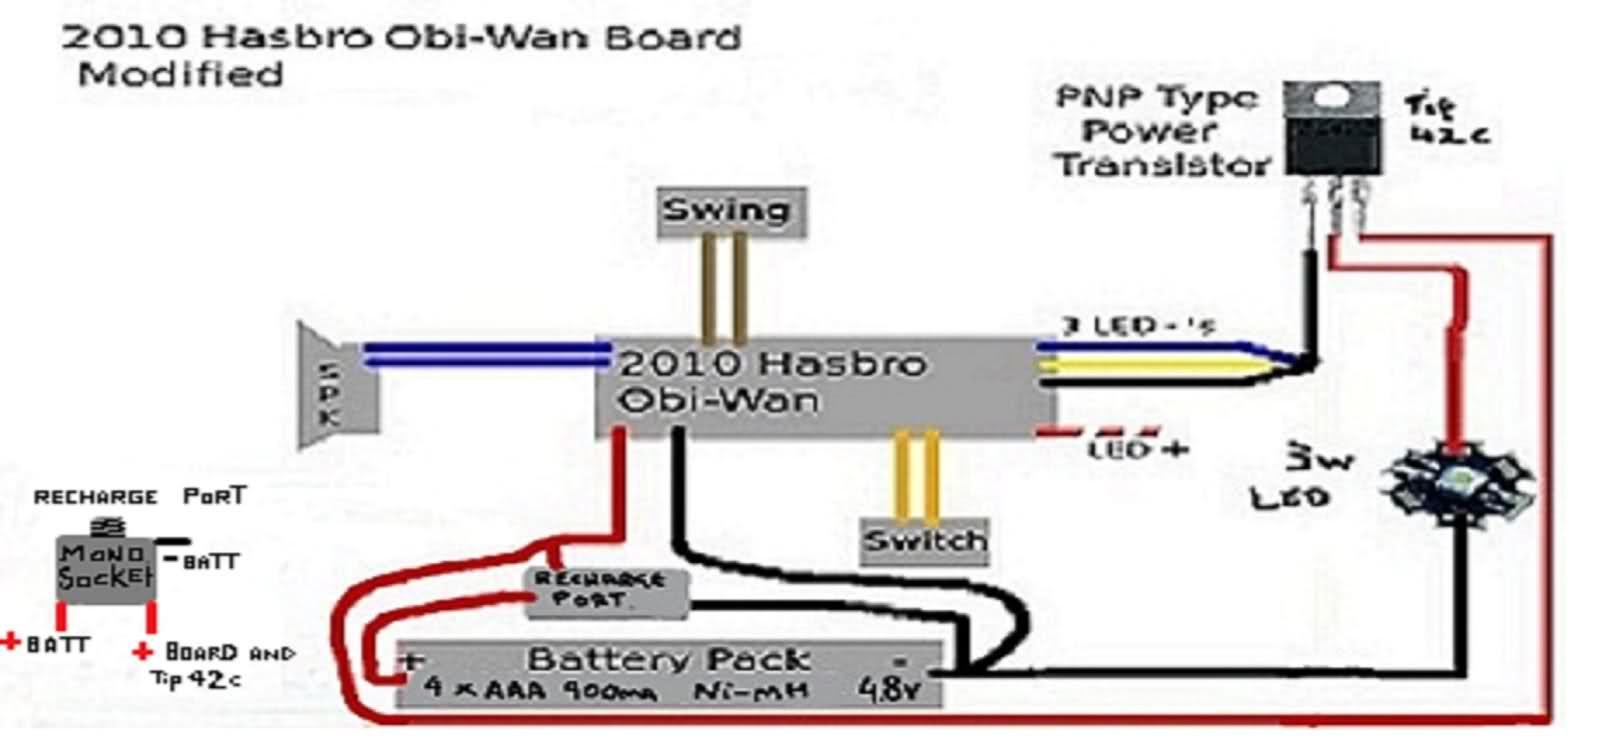 non hasbro econo sound board new ideas and technologies fx Myers Plow Wiring Diagram non hasbro econo sound board new ideas and technologies fx sabers com